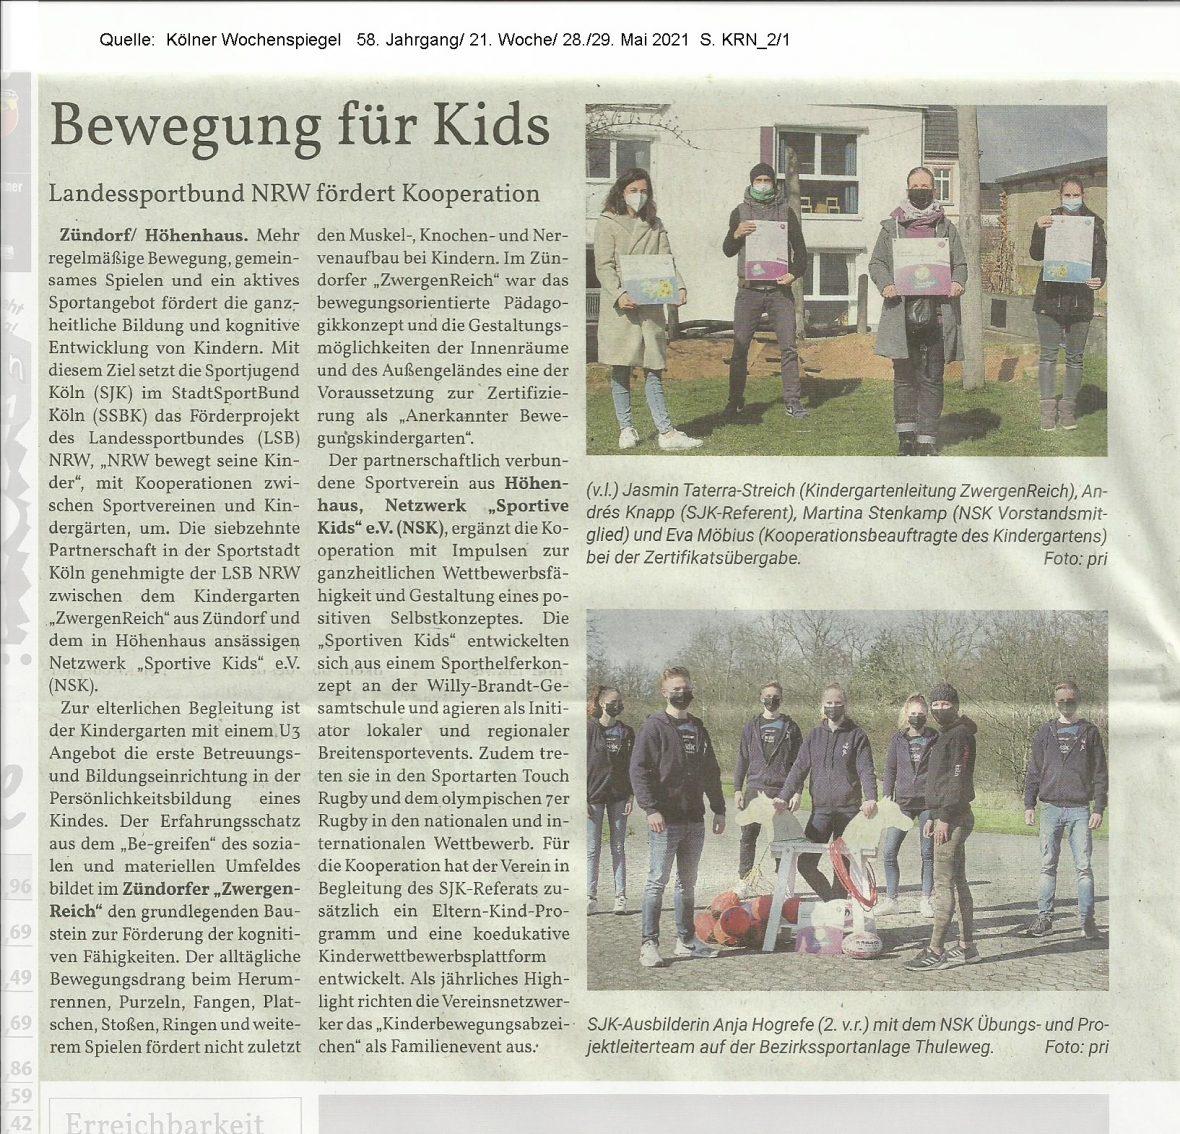 Presse 2021 Kindergartenkooperation